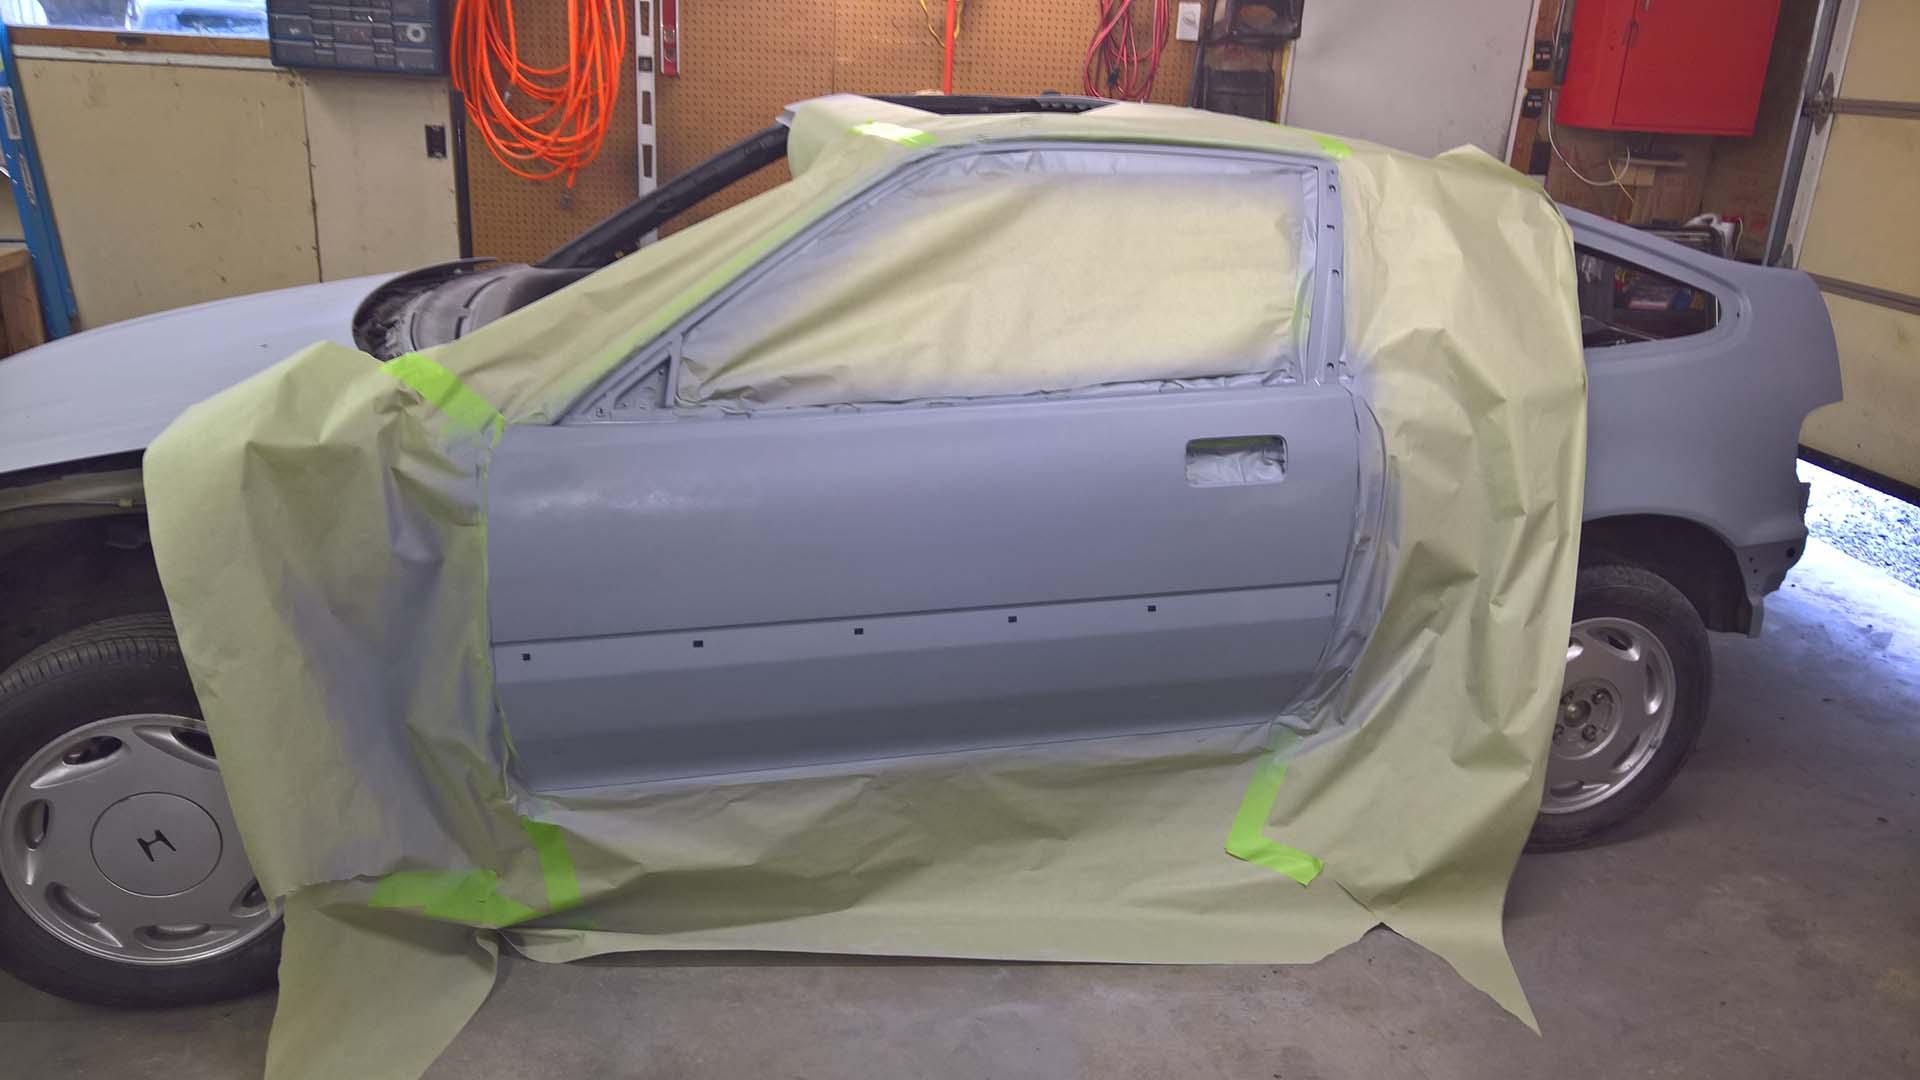 Second Coat of Primer Applied to Driver's Side Door